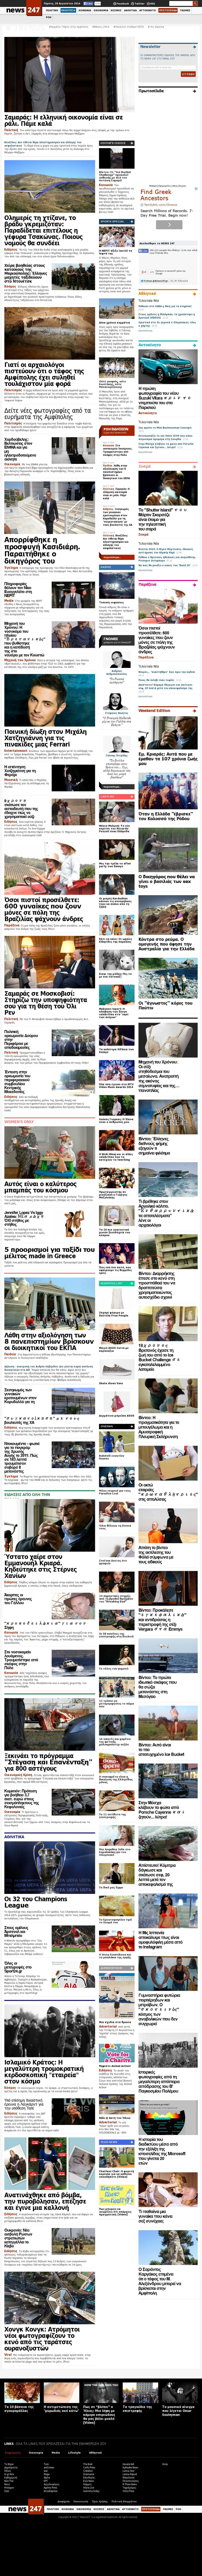 News 247 at Wednesday Aug. 27, 2014, 10:11 p.m. UTC